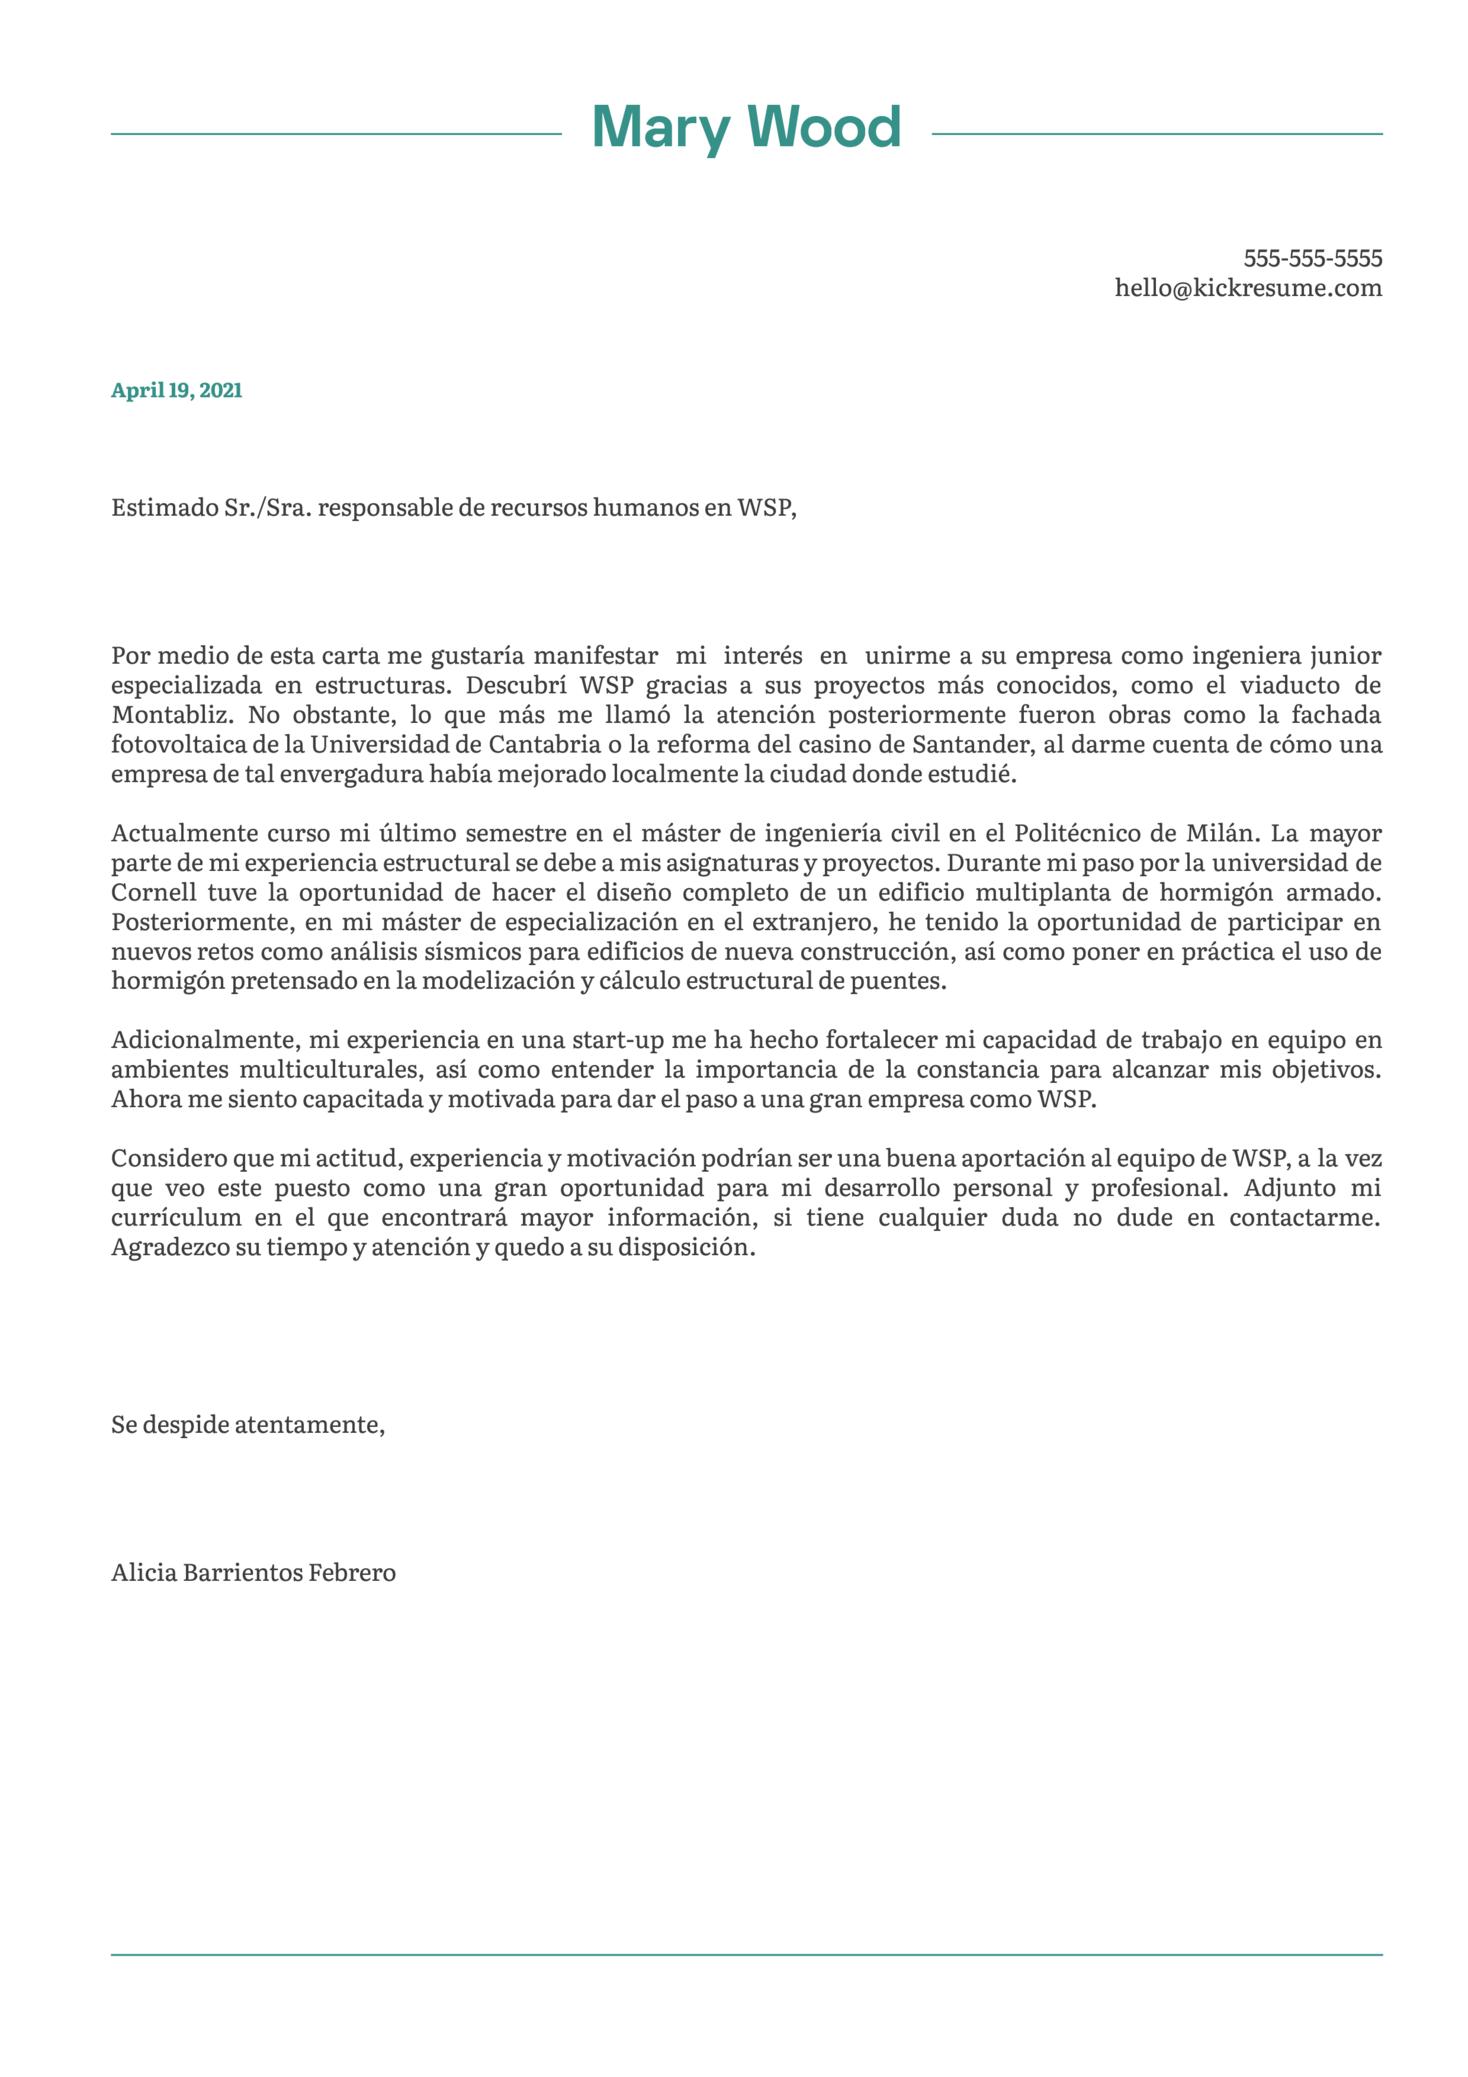 Junior Civil Engineer at WSP Cover Letter Sample [ES]